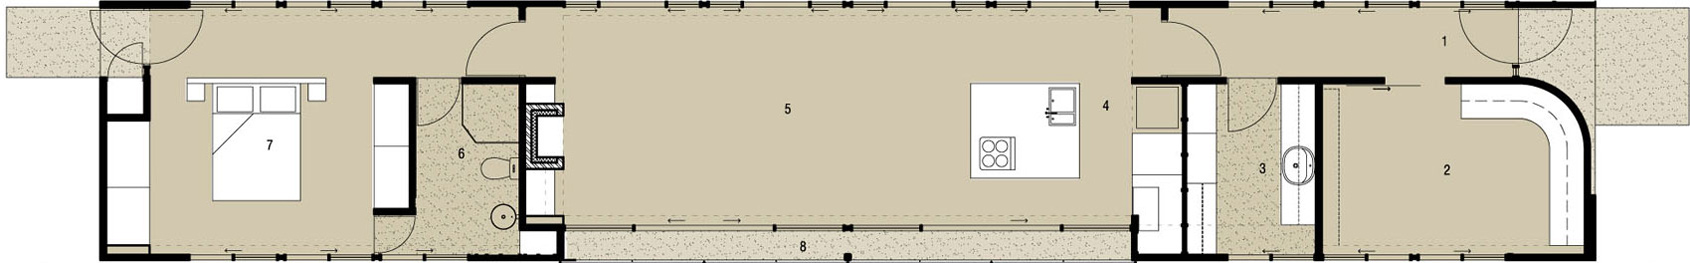 Floor Plan, Bridge House in Adelaide, Australia by Max Pritchard Architect